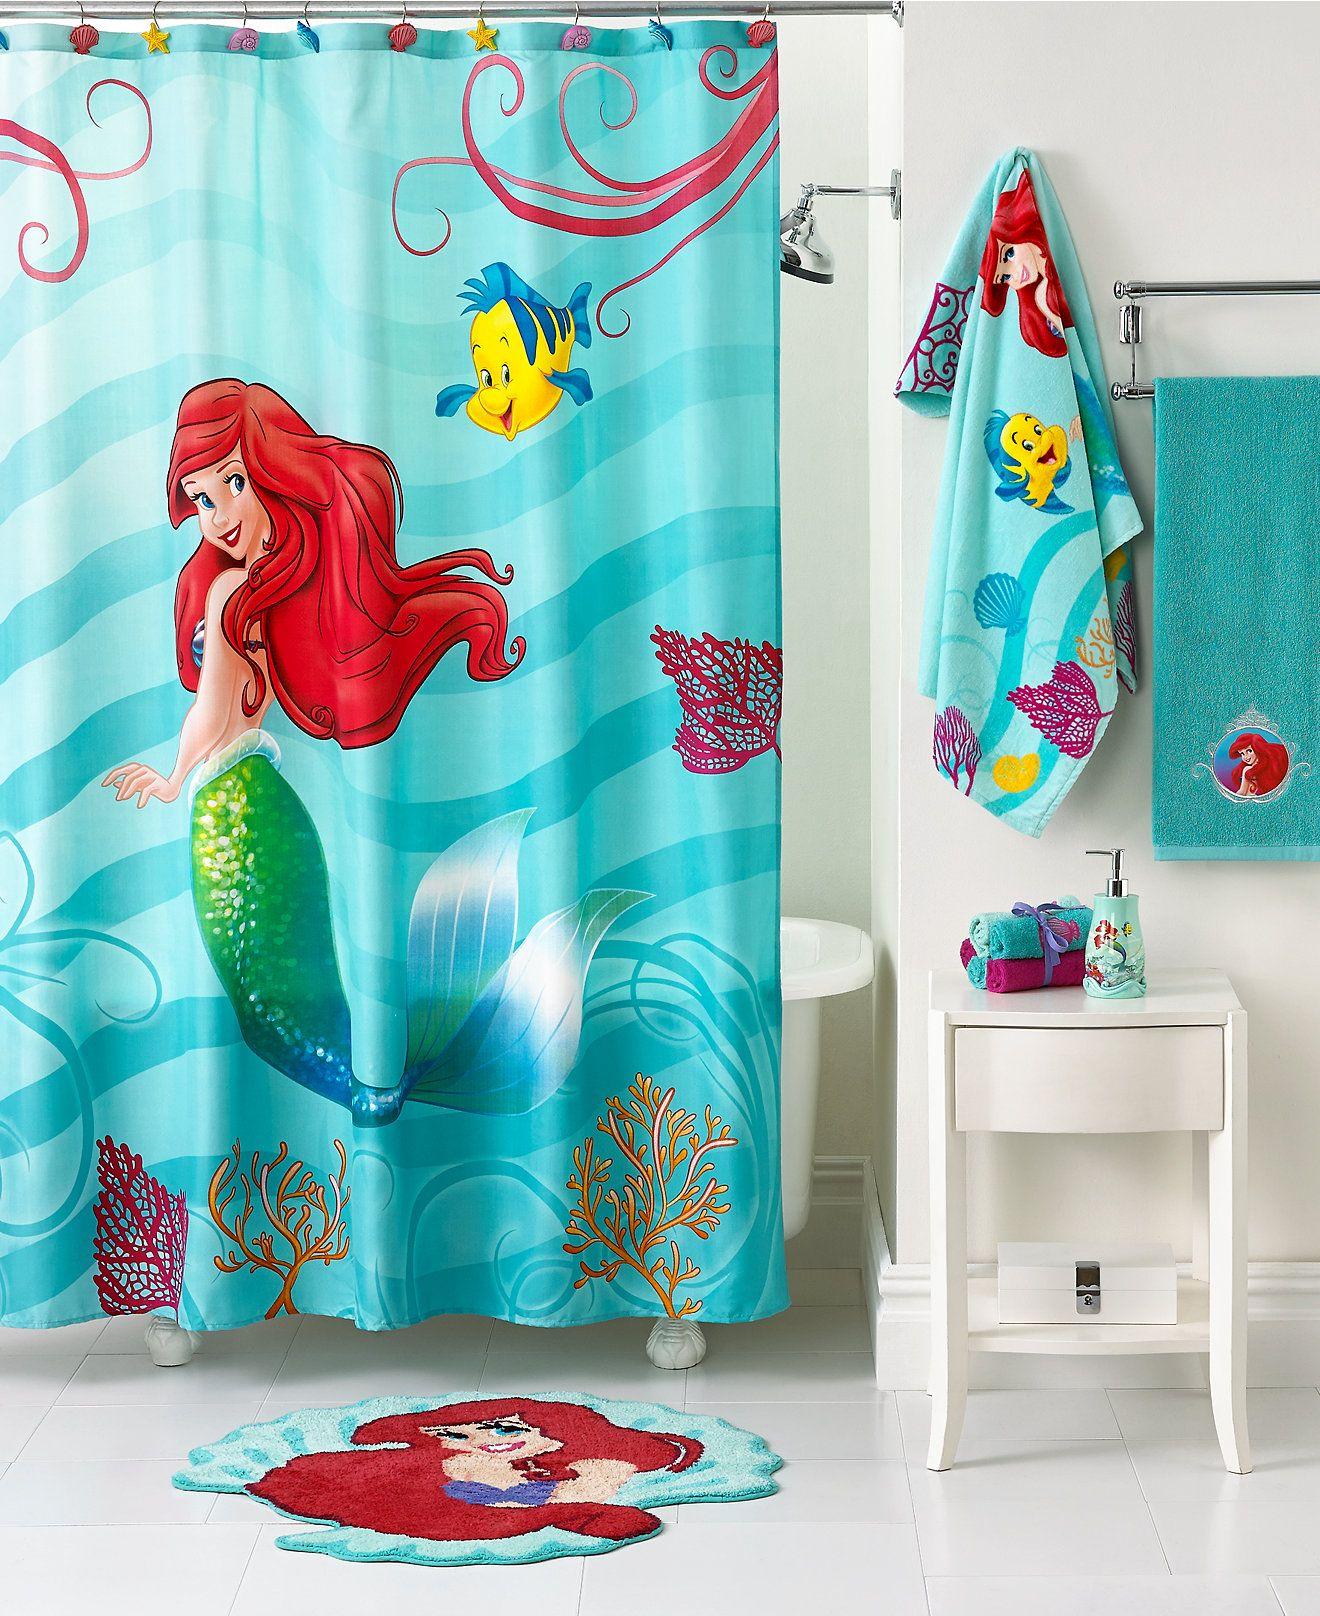 Mermaid Shower Curtains With Valance Bathroom Room